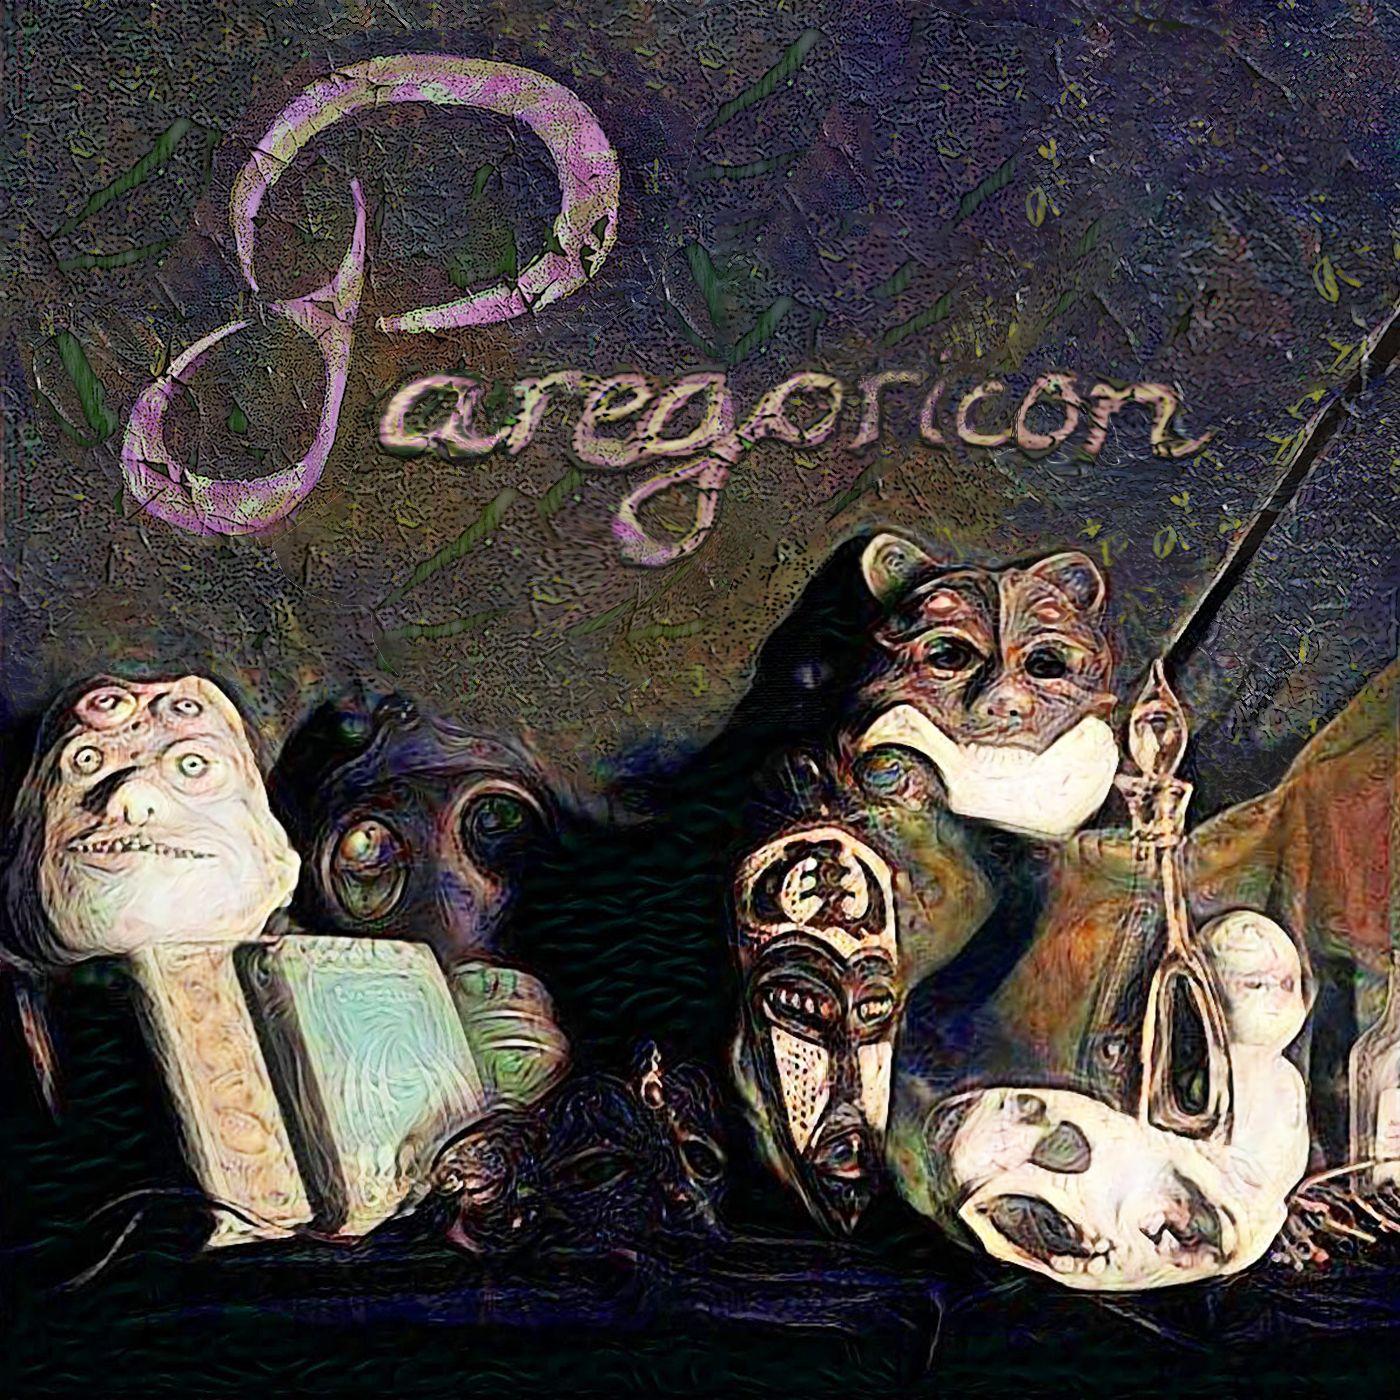 Paregoricon